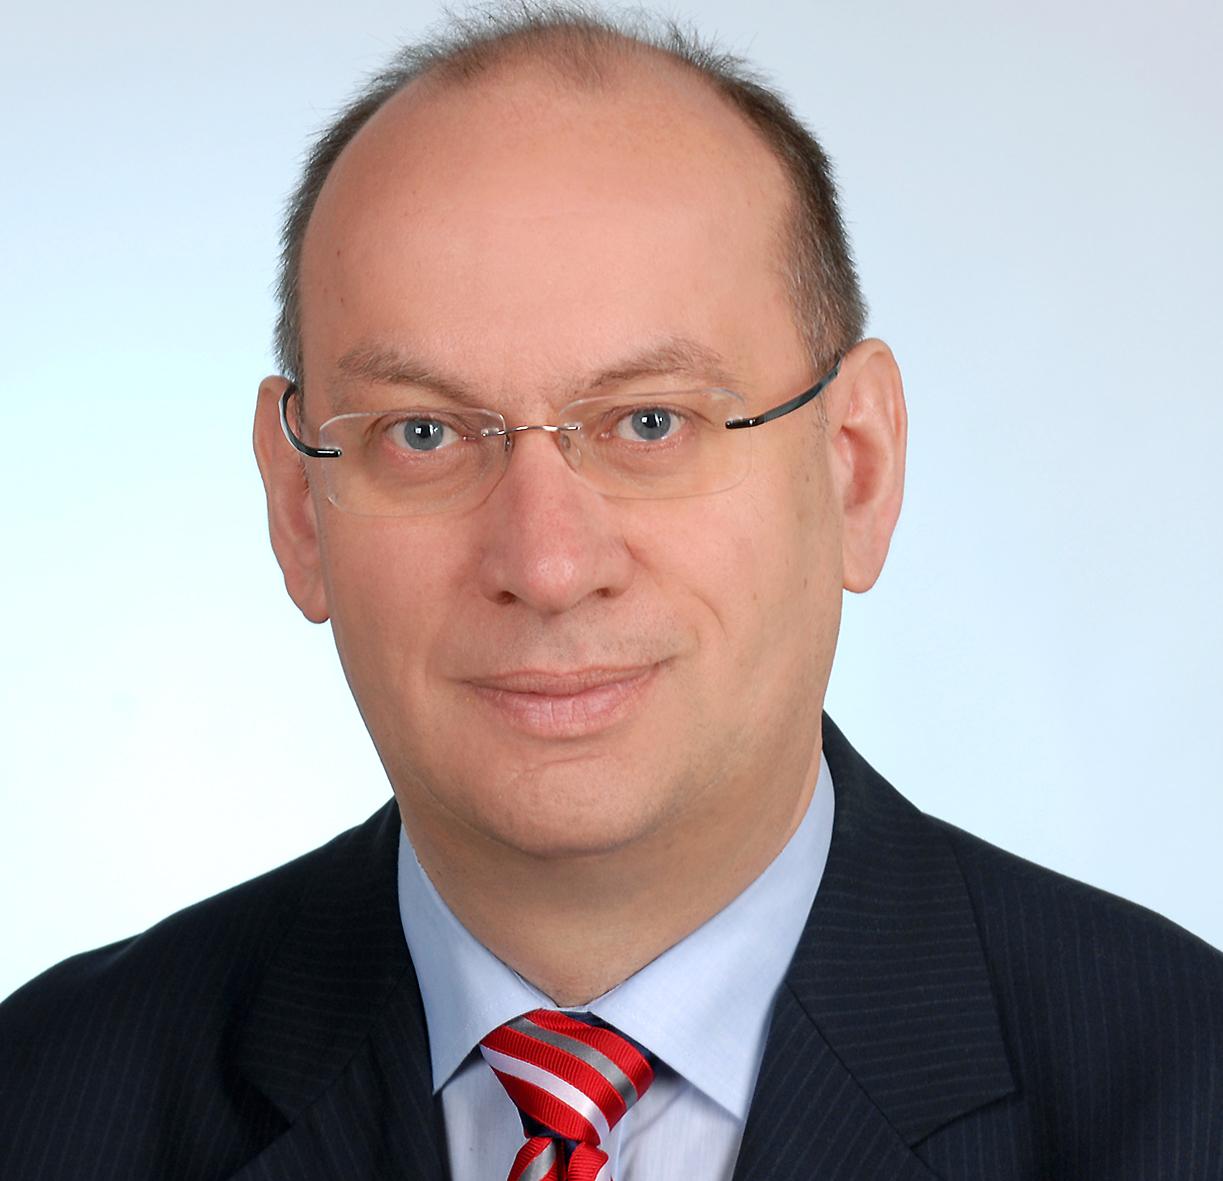 Rudi Kramer BvD Datenschutz